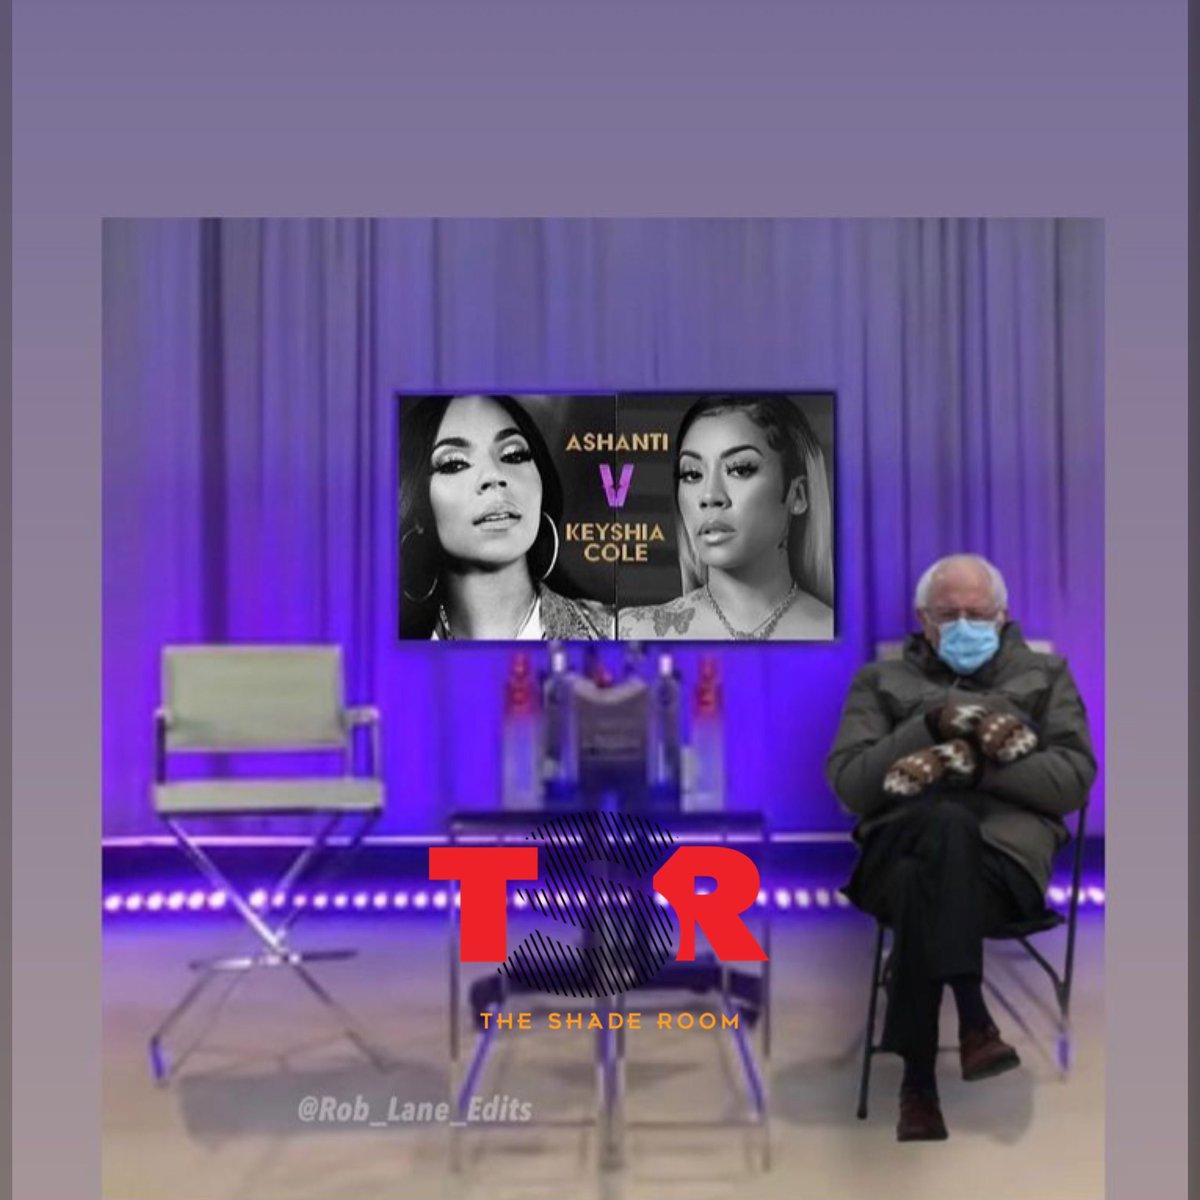 This how y'all waiting for the Keyshia Cole & Ashanti 'Verzuz' battle to start?😂 (📸:@rob_lane_edits)